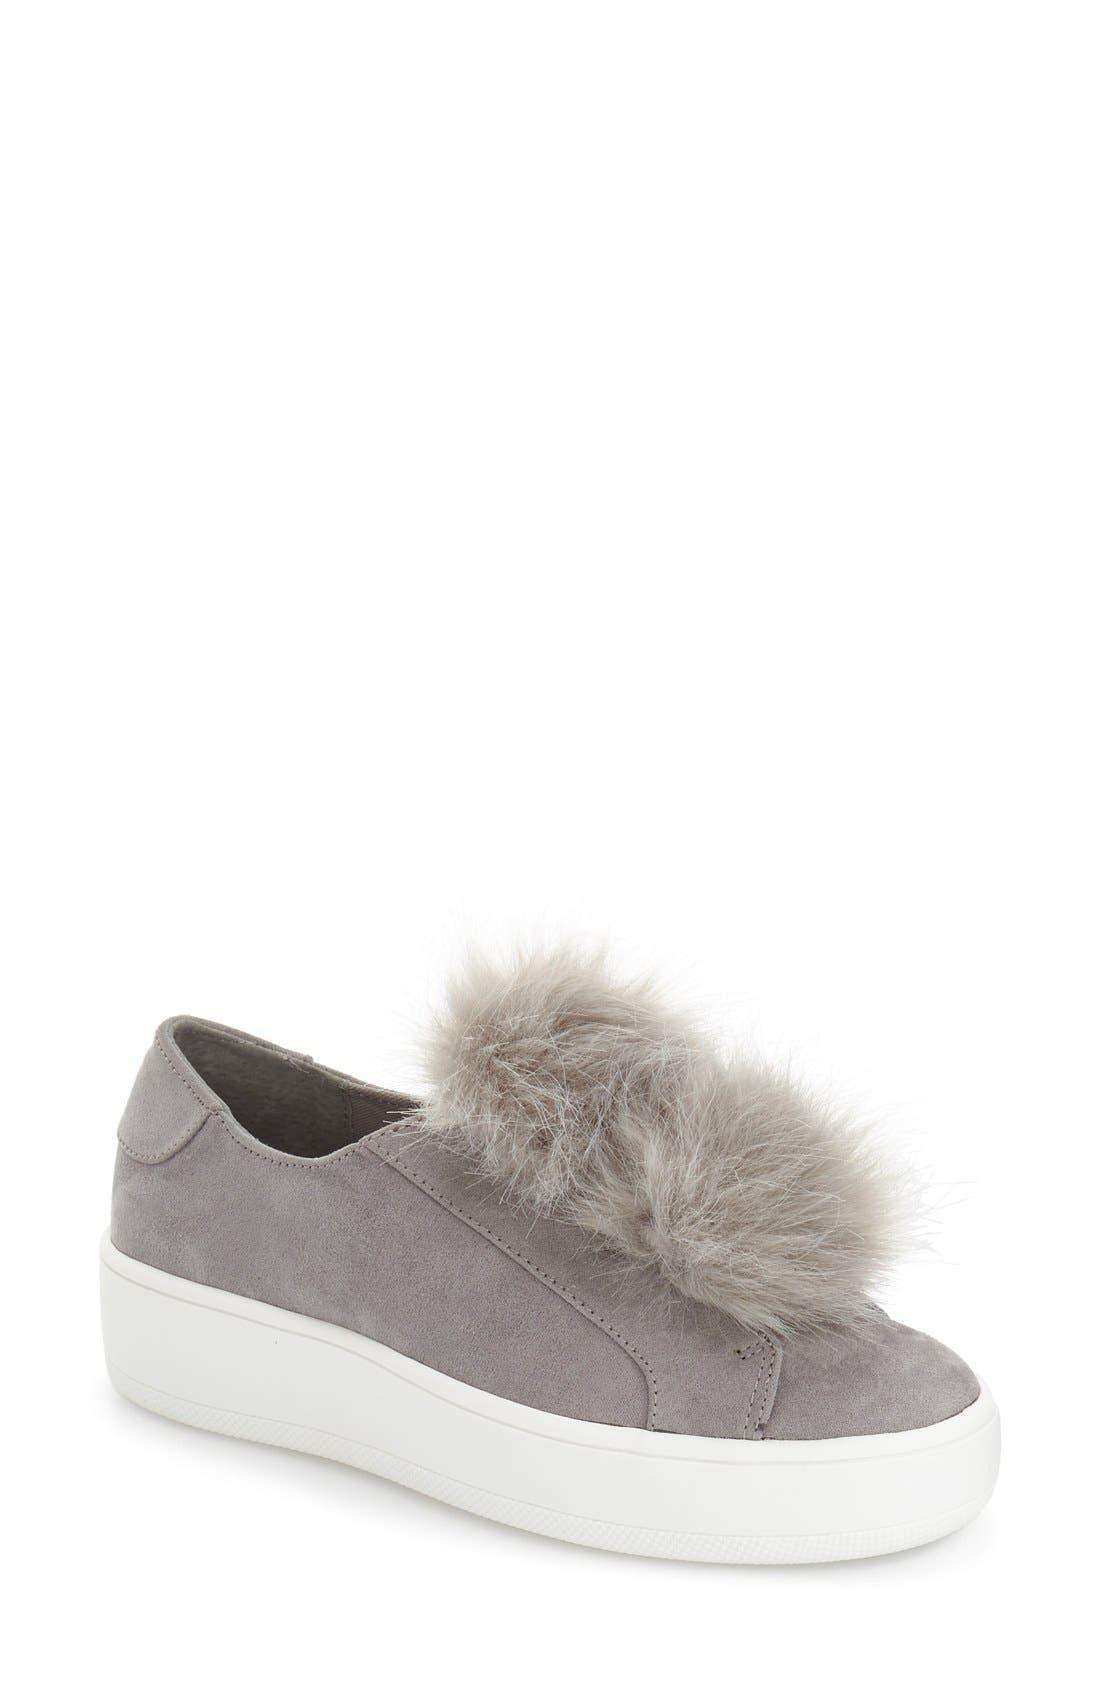 Steve Madden 'Bryanne' Puffball Platform Sneaker (Women)